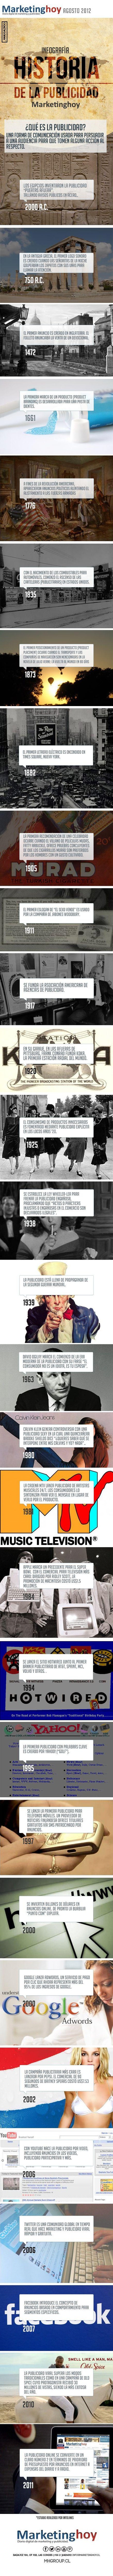 Historia de la publicidad #infografia #infographic #marketing